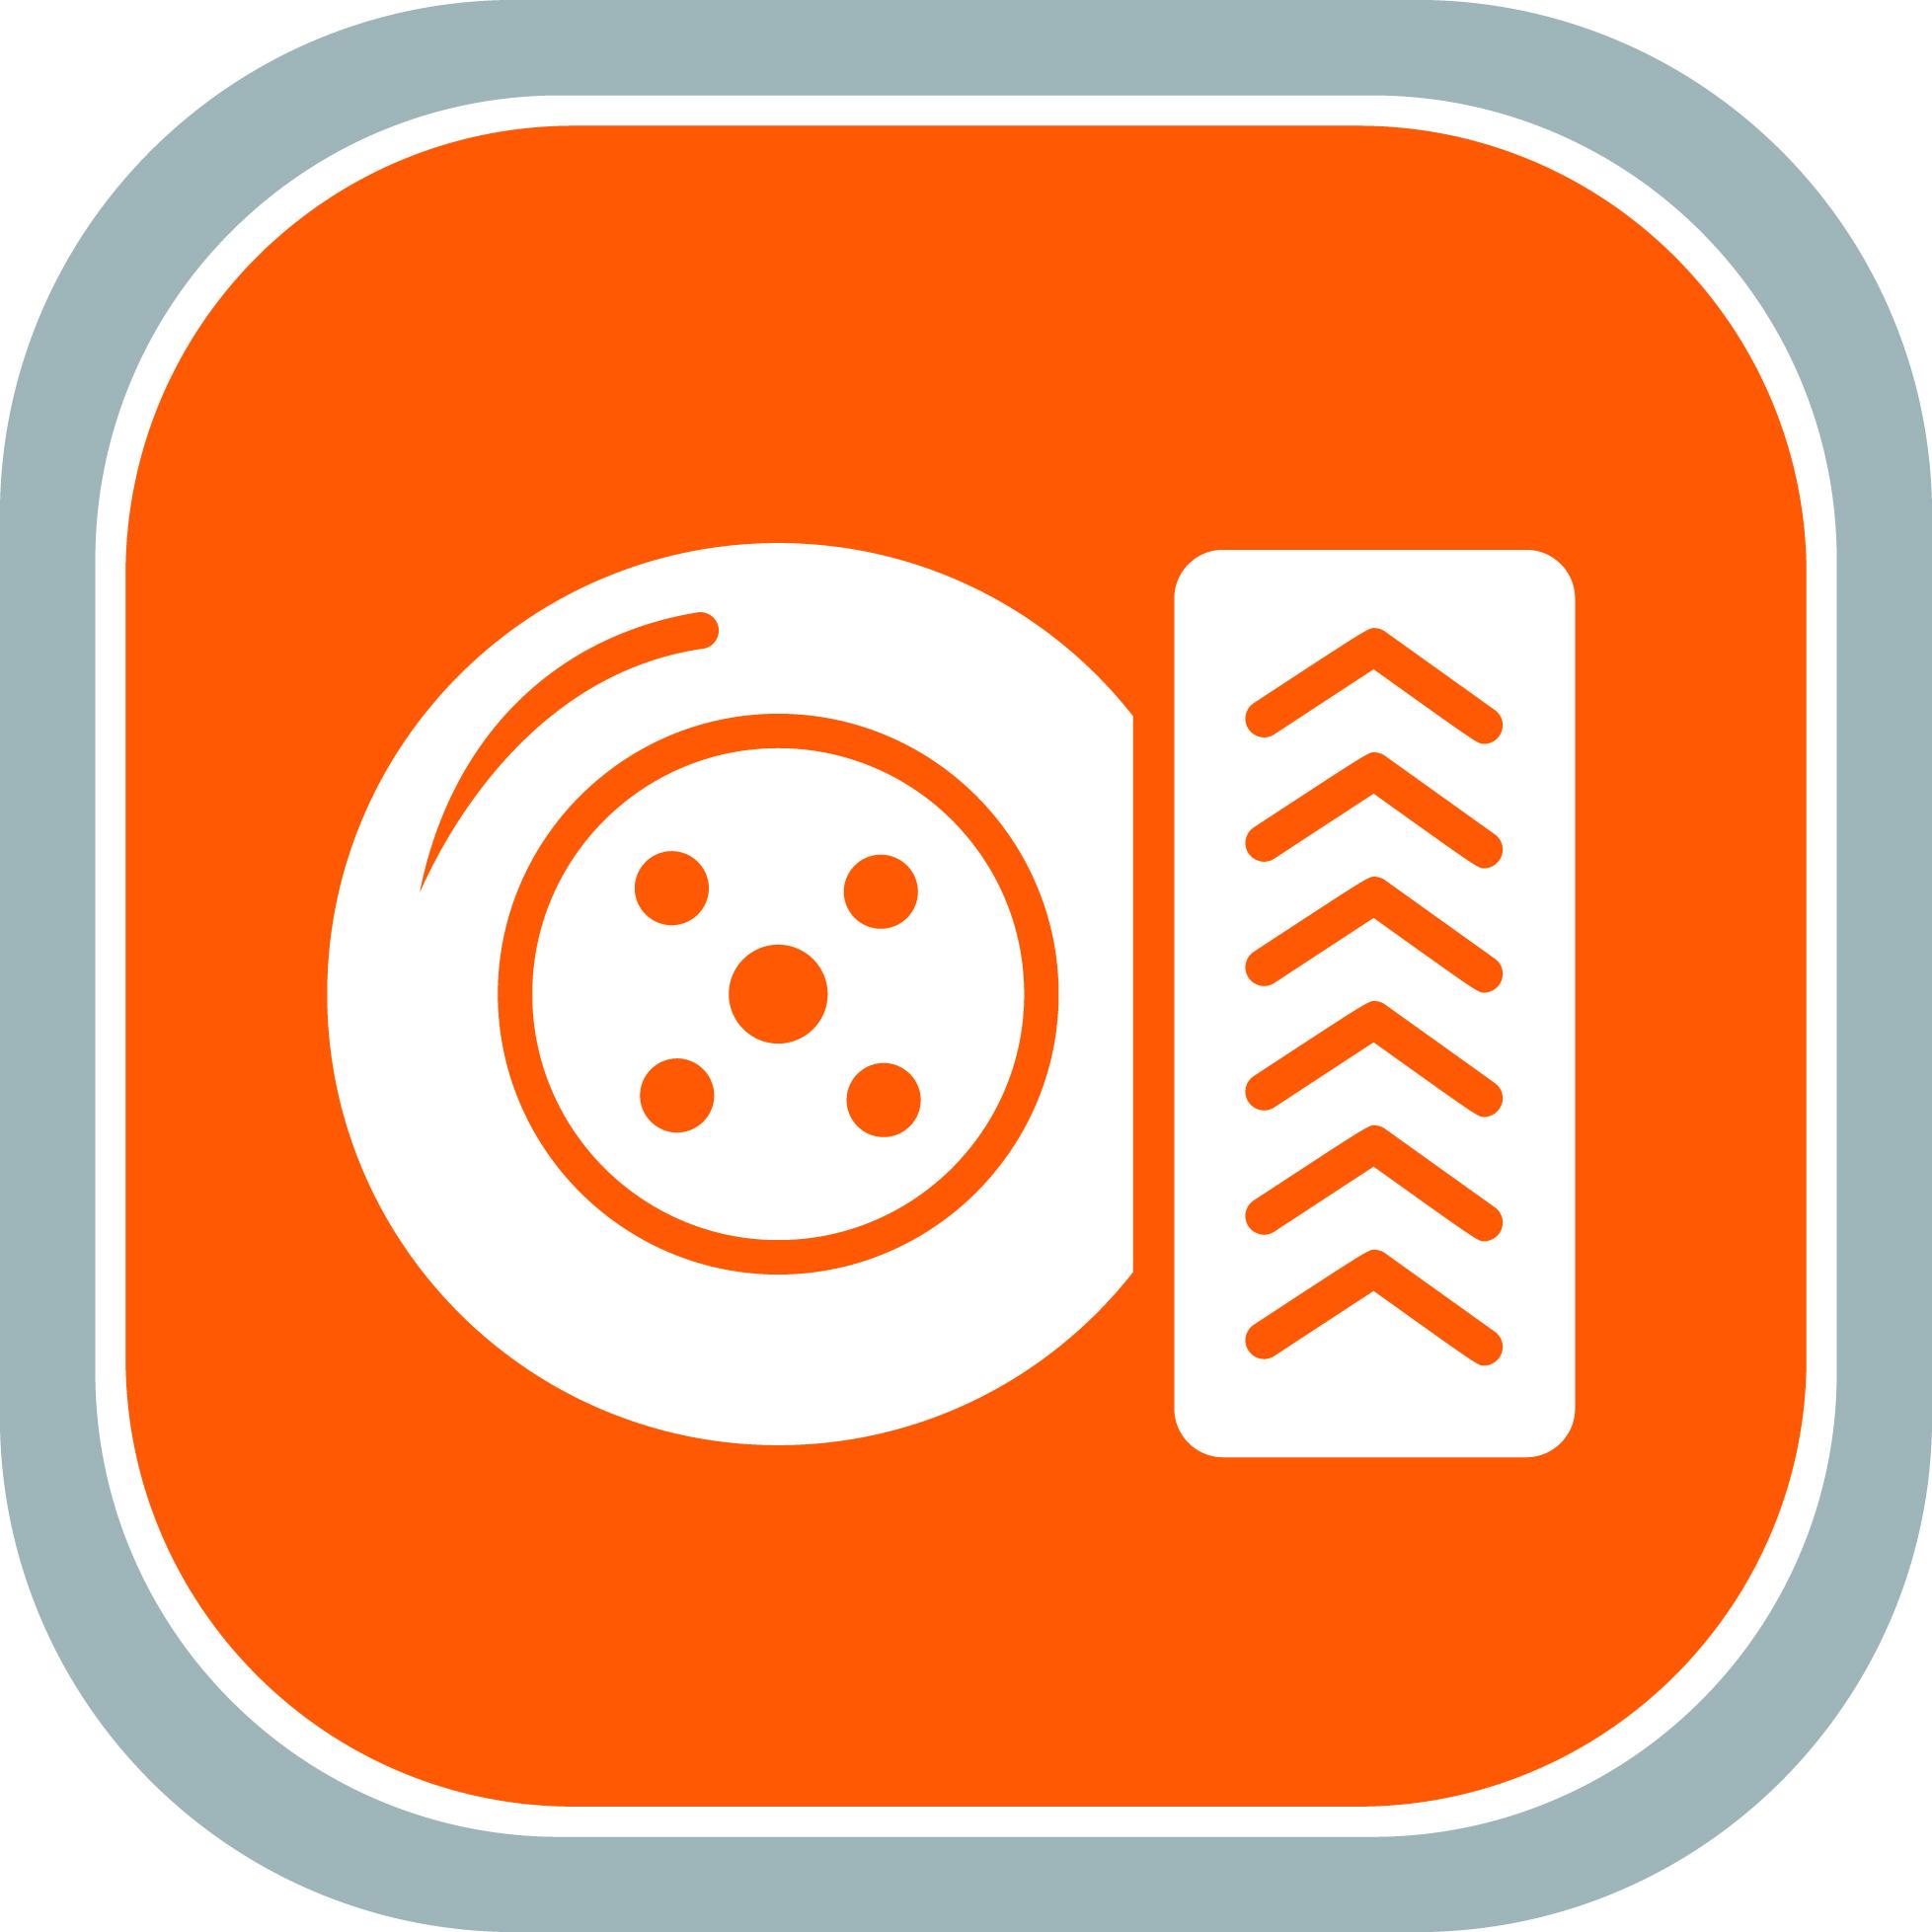 Pneumatiky logo